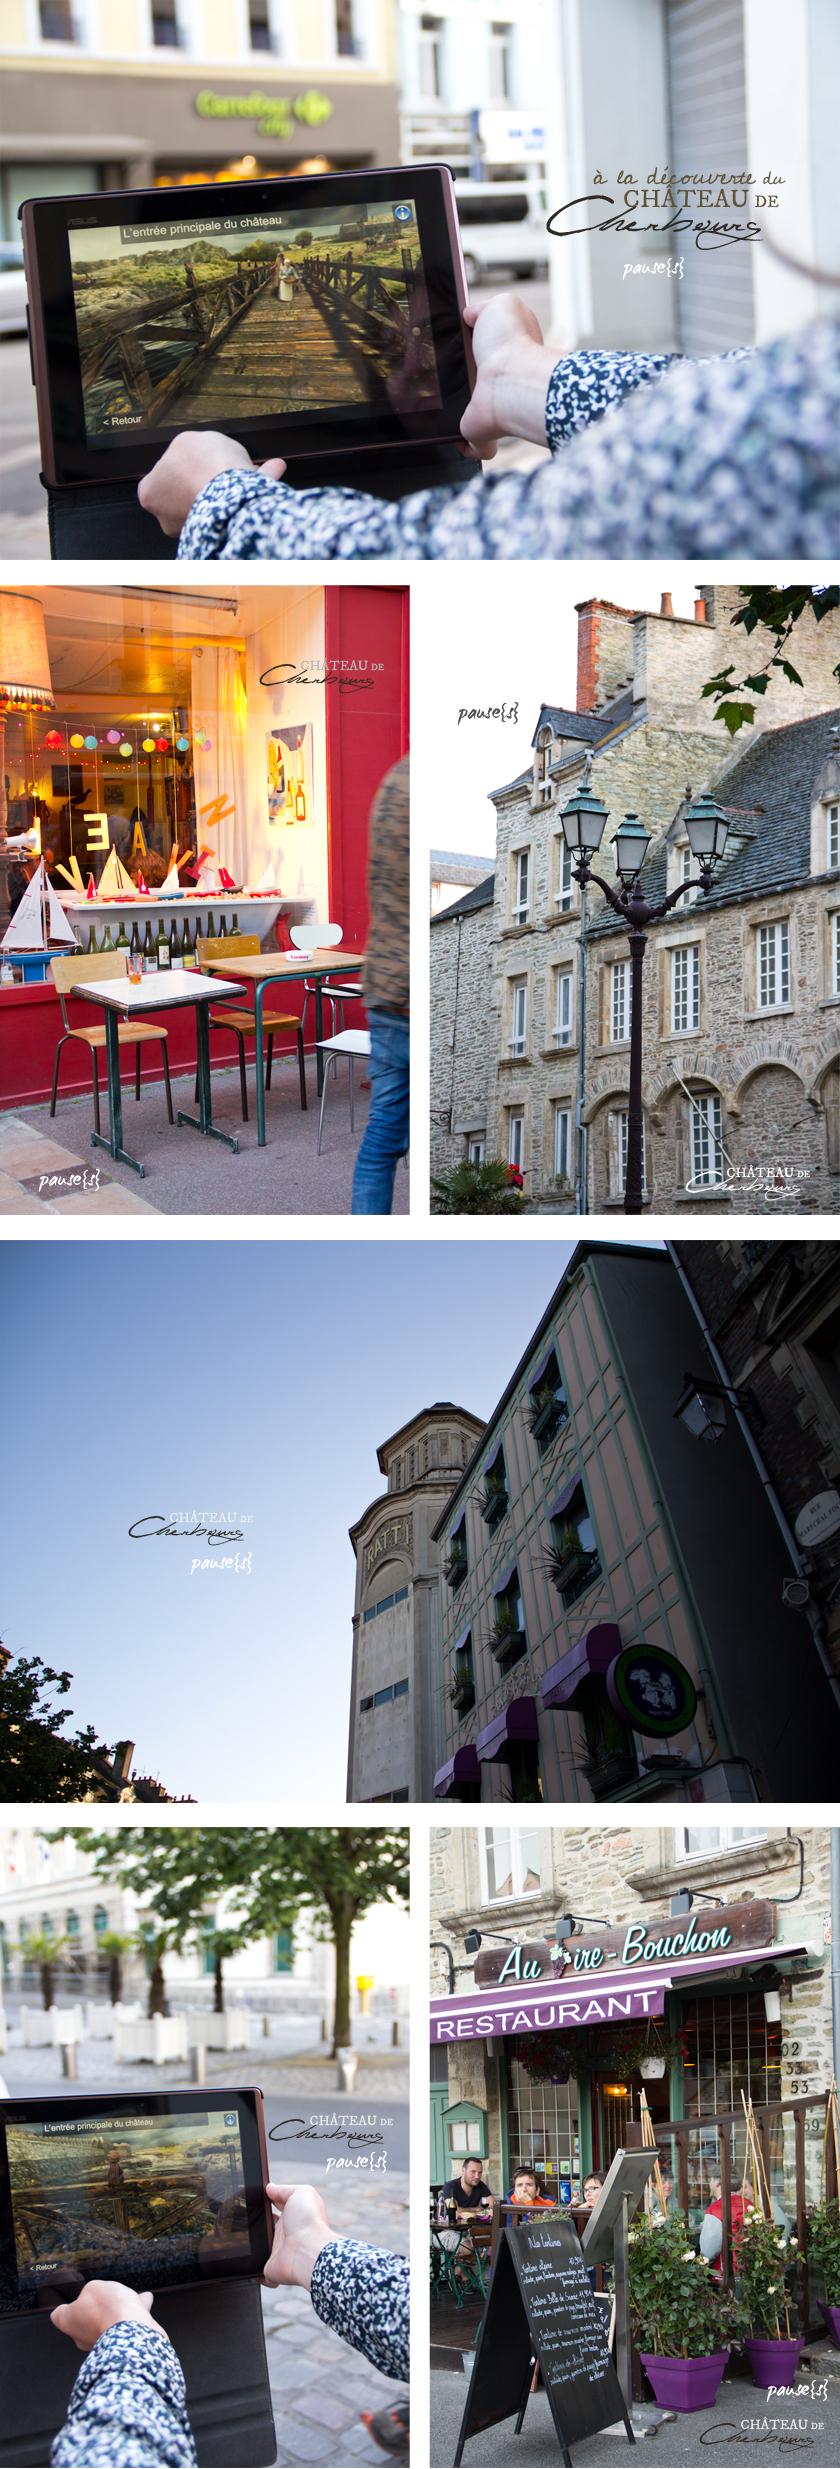 chateau_chbg_01